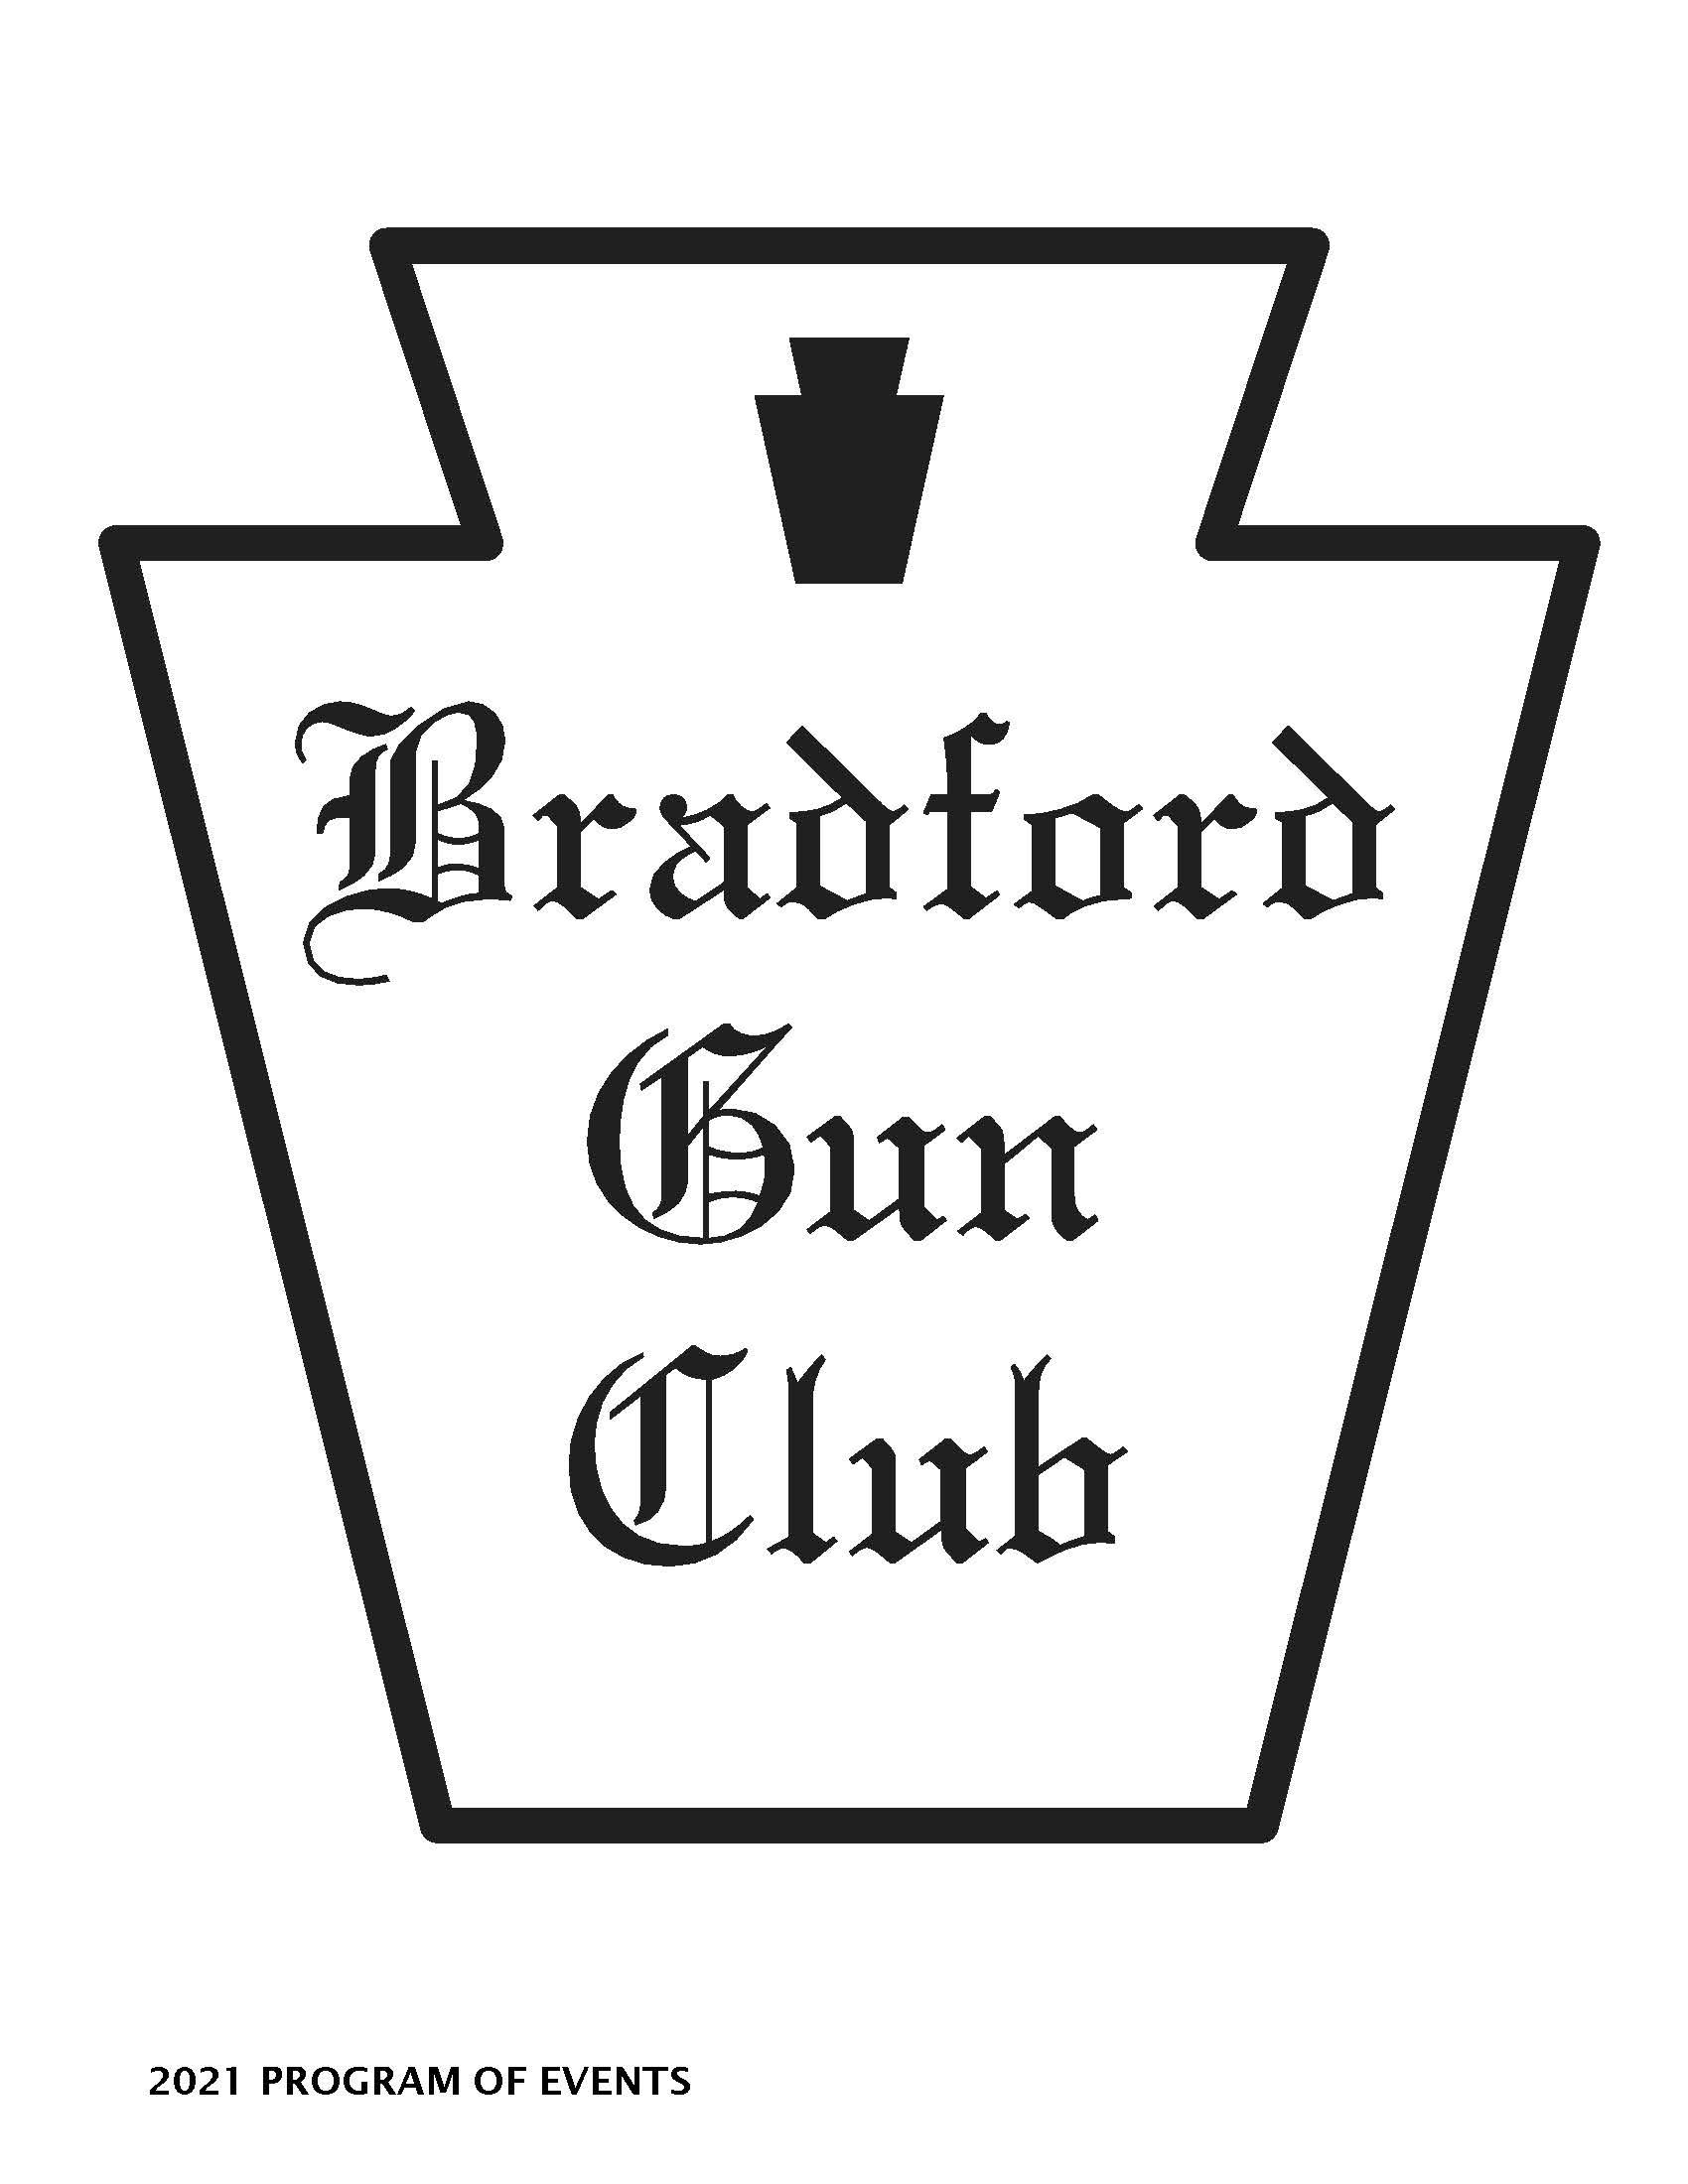 http://bradfordgunclub.com/wp-content/uploads/2021/03/BGC-2021-Program-of-Events-booklet.pdf